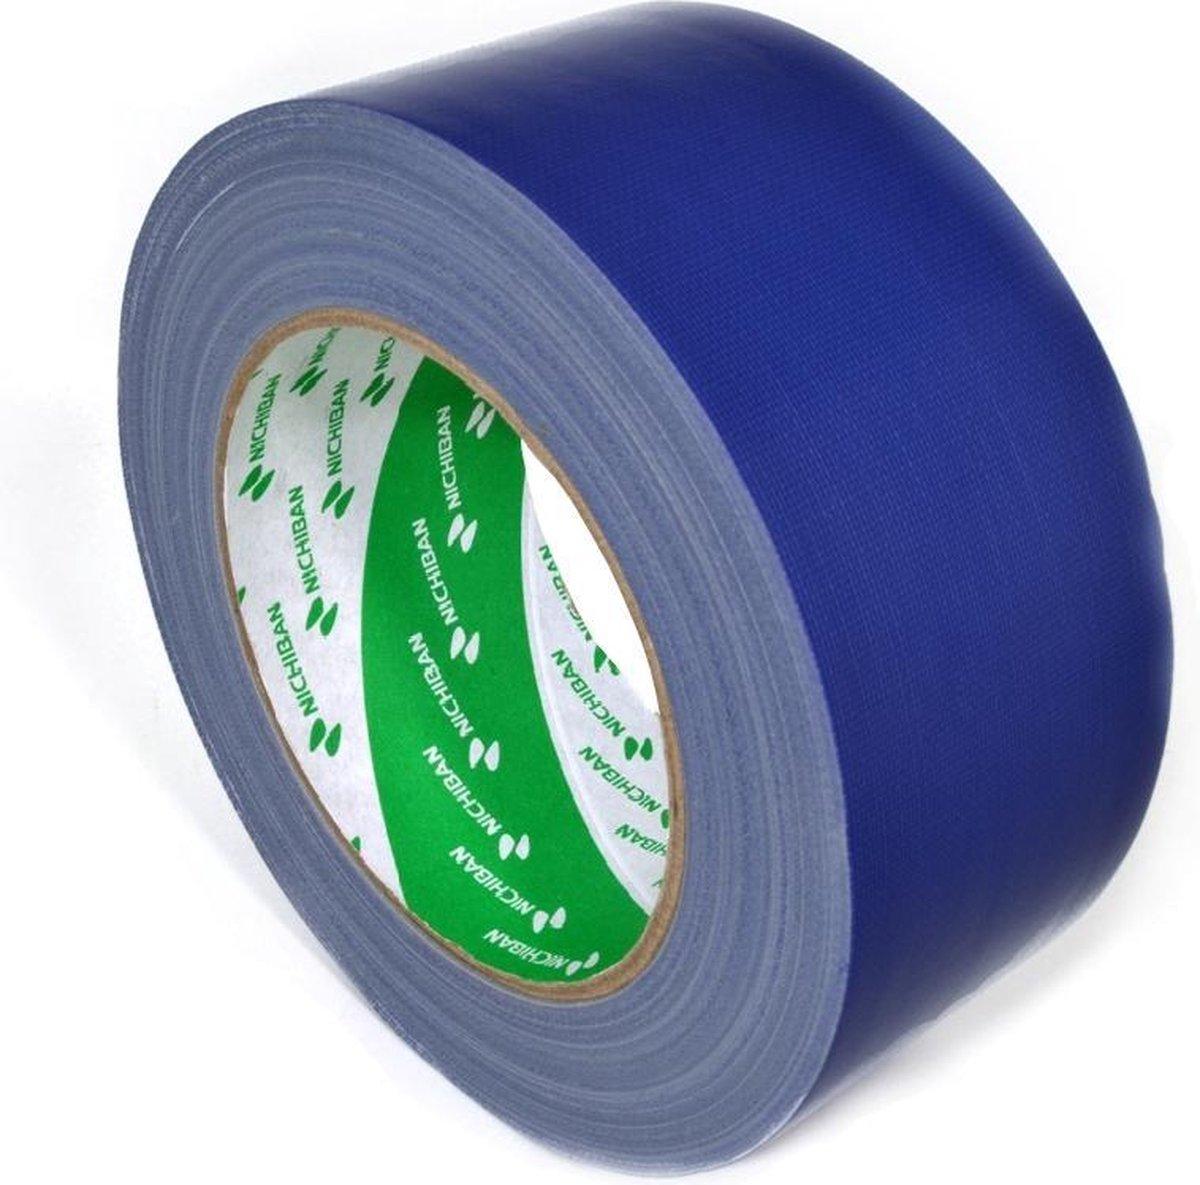 Nichiban tape 50mm x 25m blauw - Nichiban